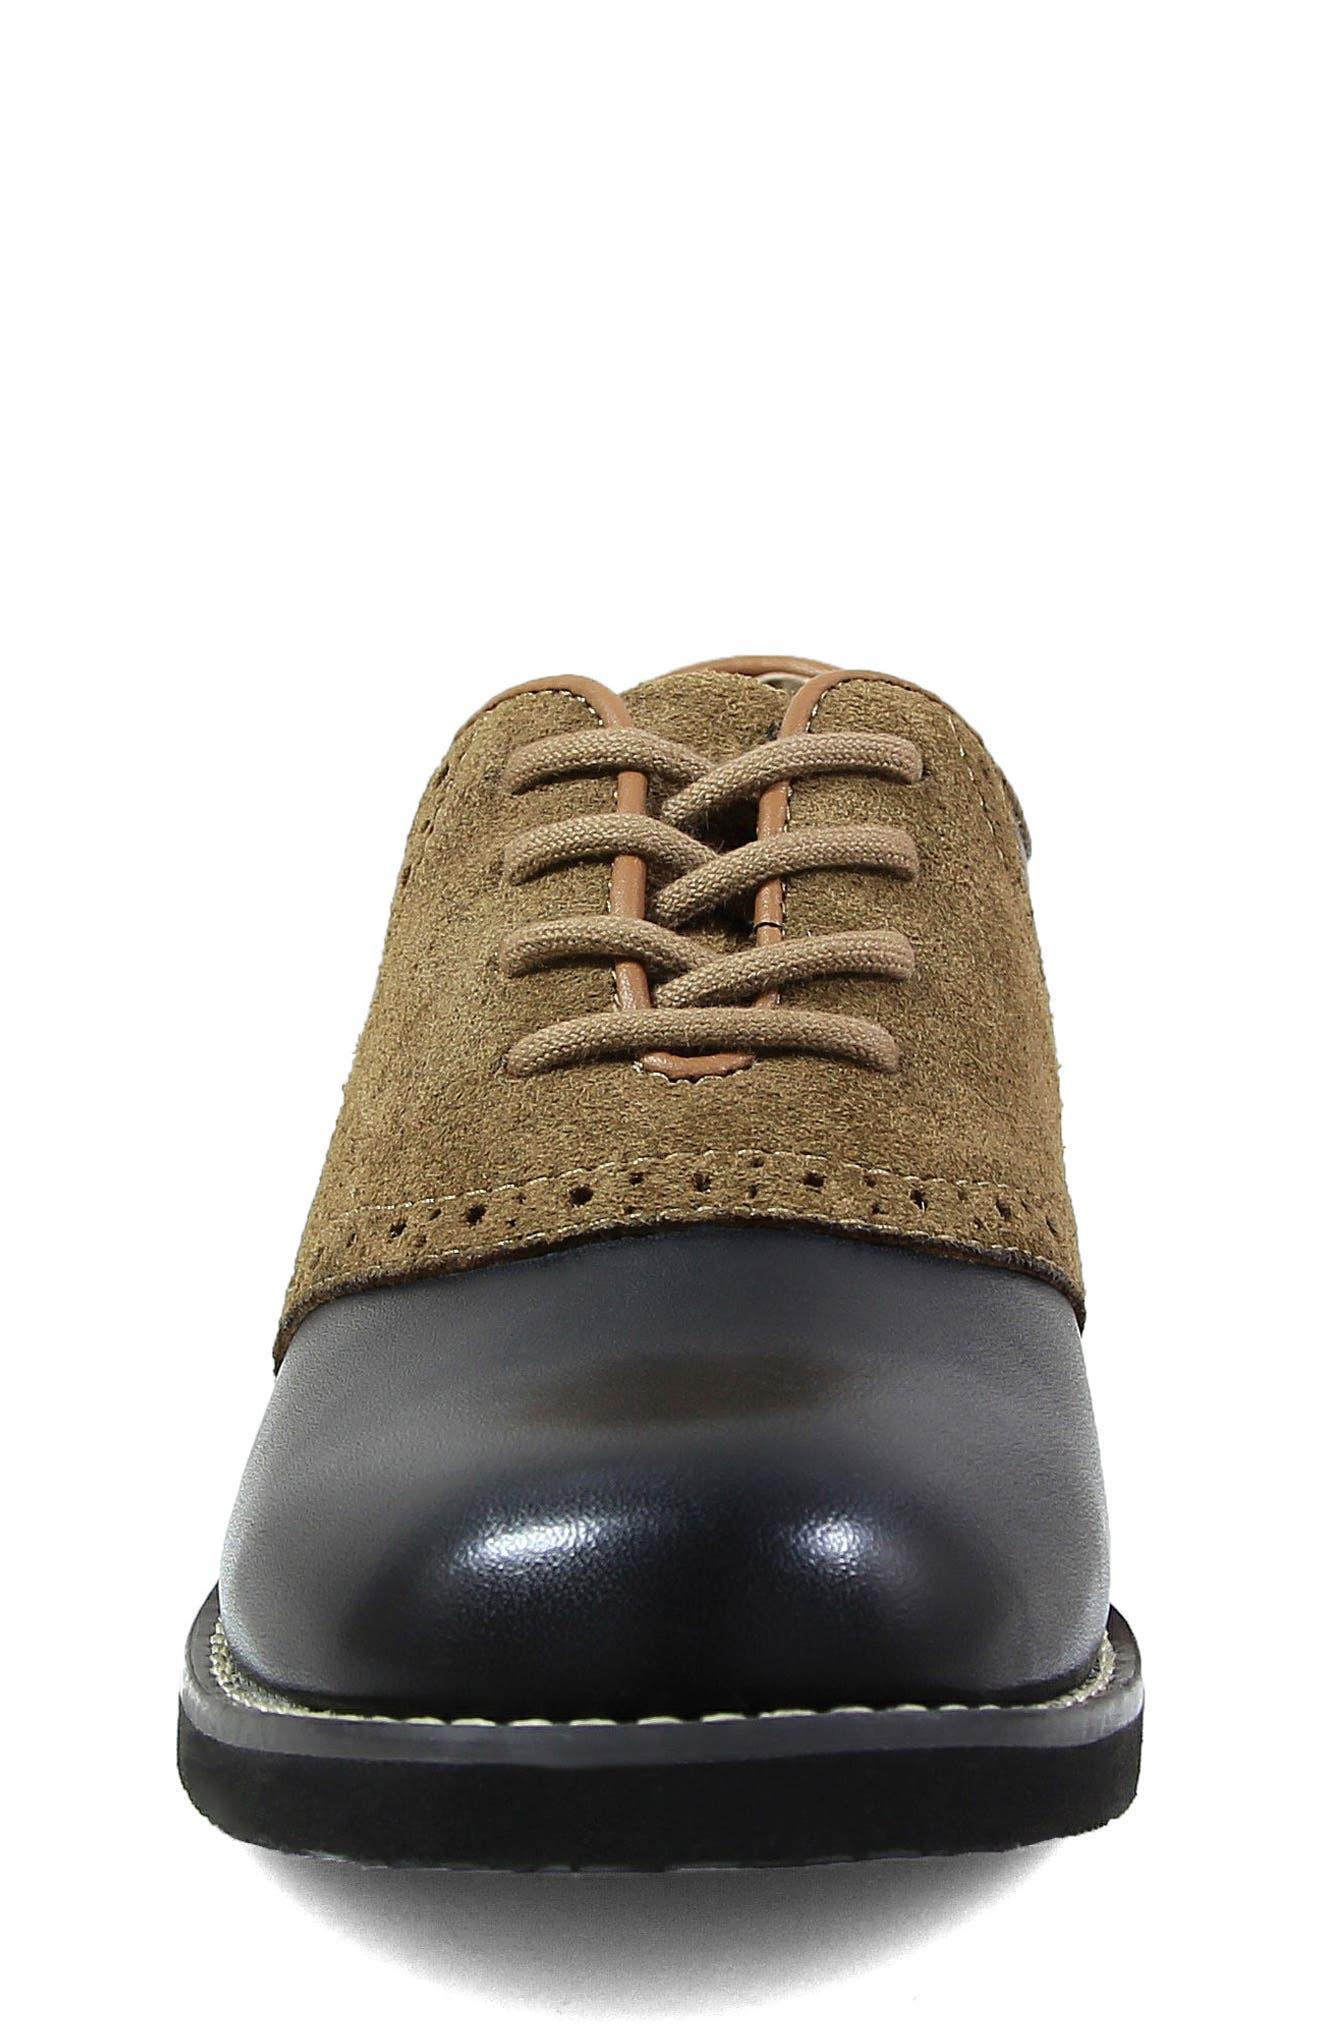 FLORSHEIM, 'Kennett Jr. II' Saddle Shoe, Alternate thumbnail 3, color, SMOOTH BLACK W/ MOCHA SUEDE